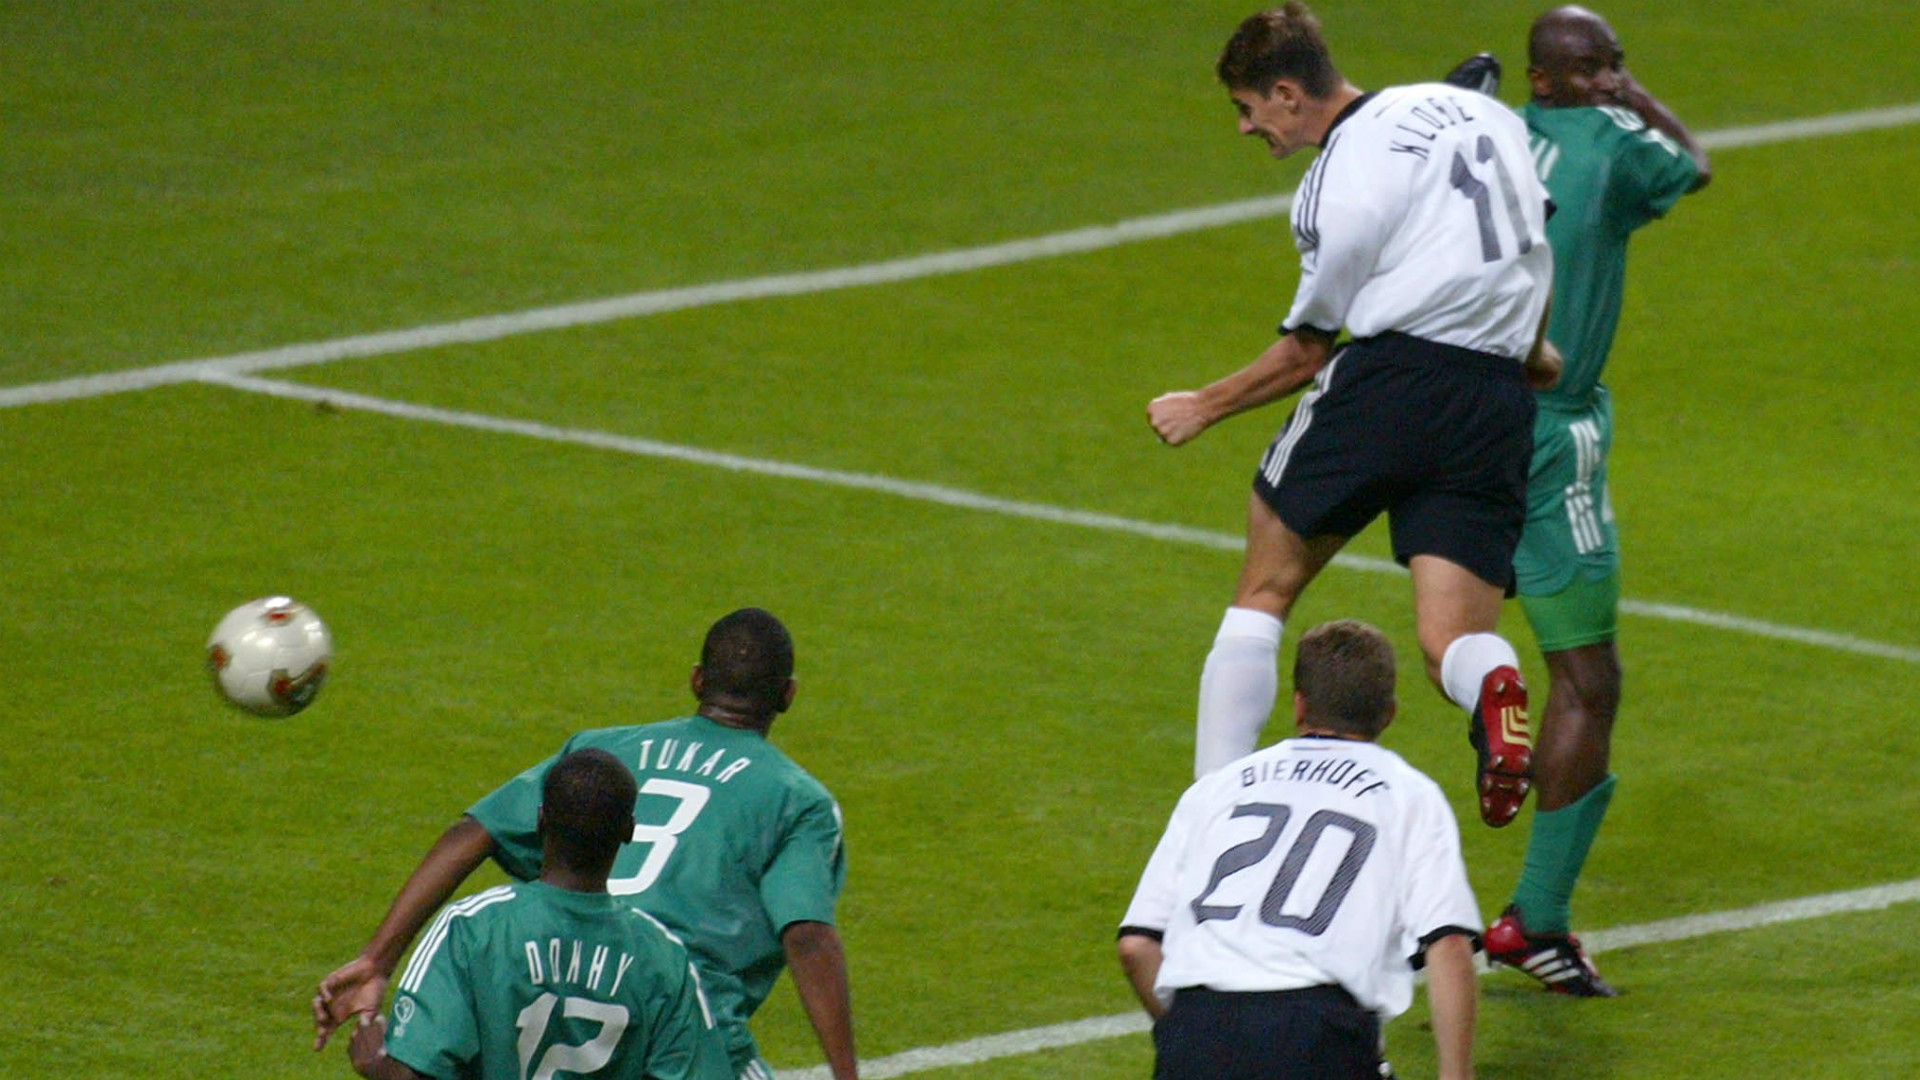 Alemania Arabia Saudita Copa del Mundo 2002